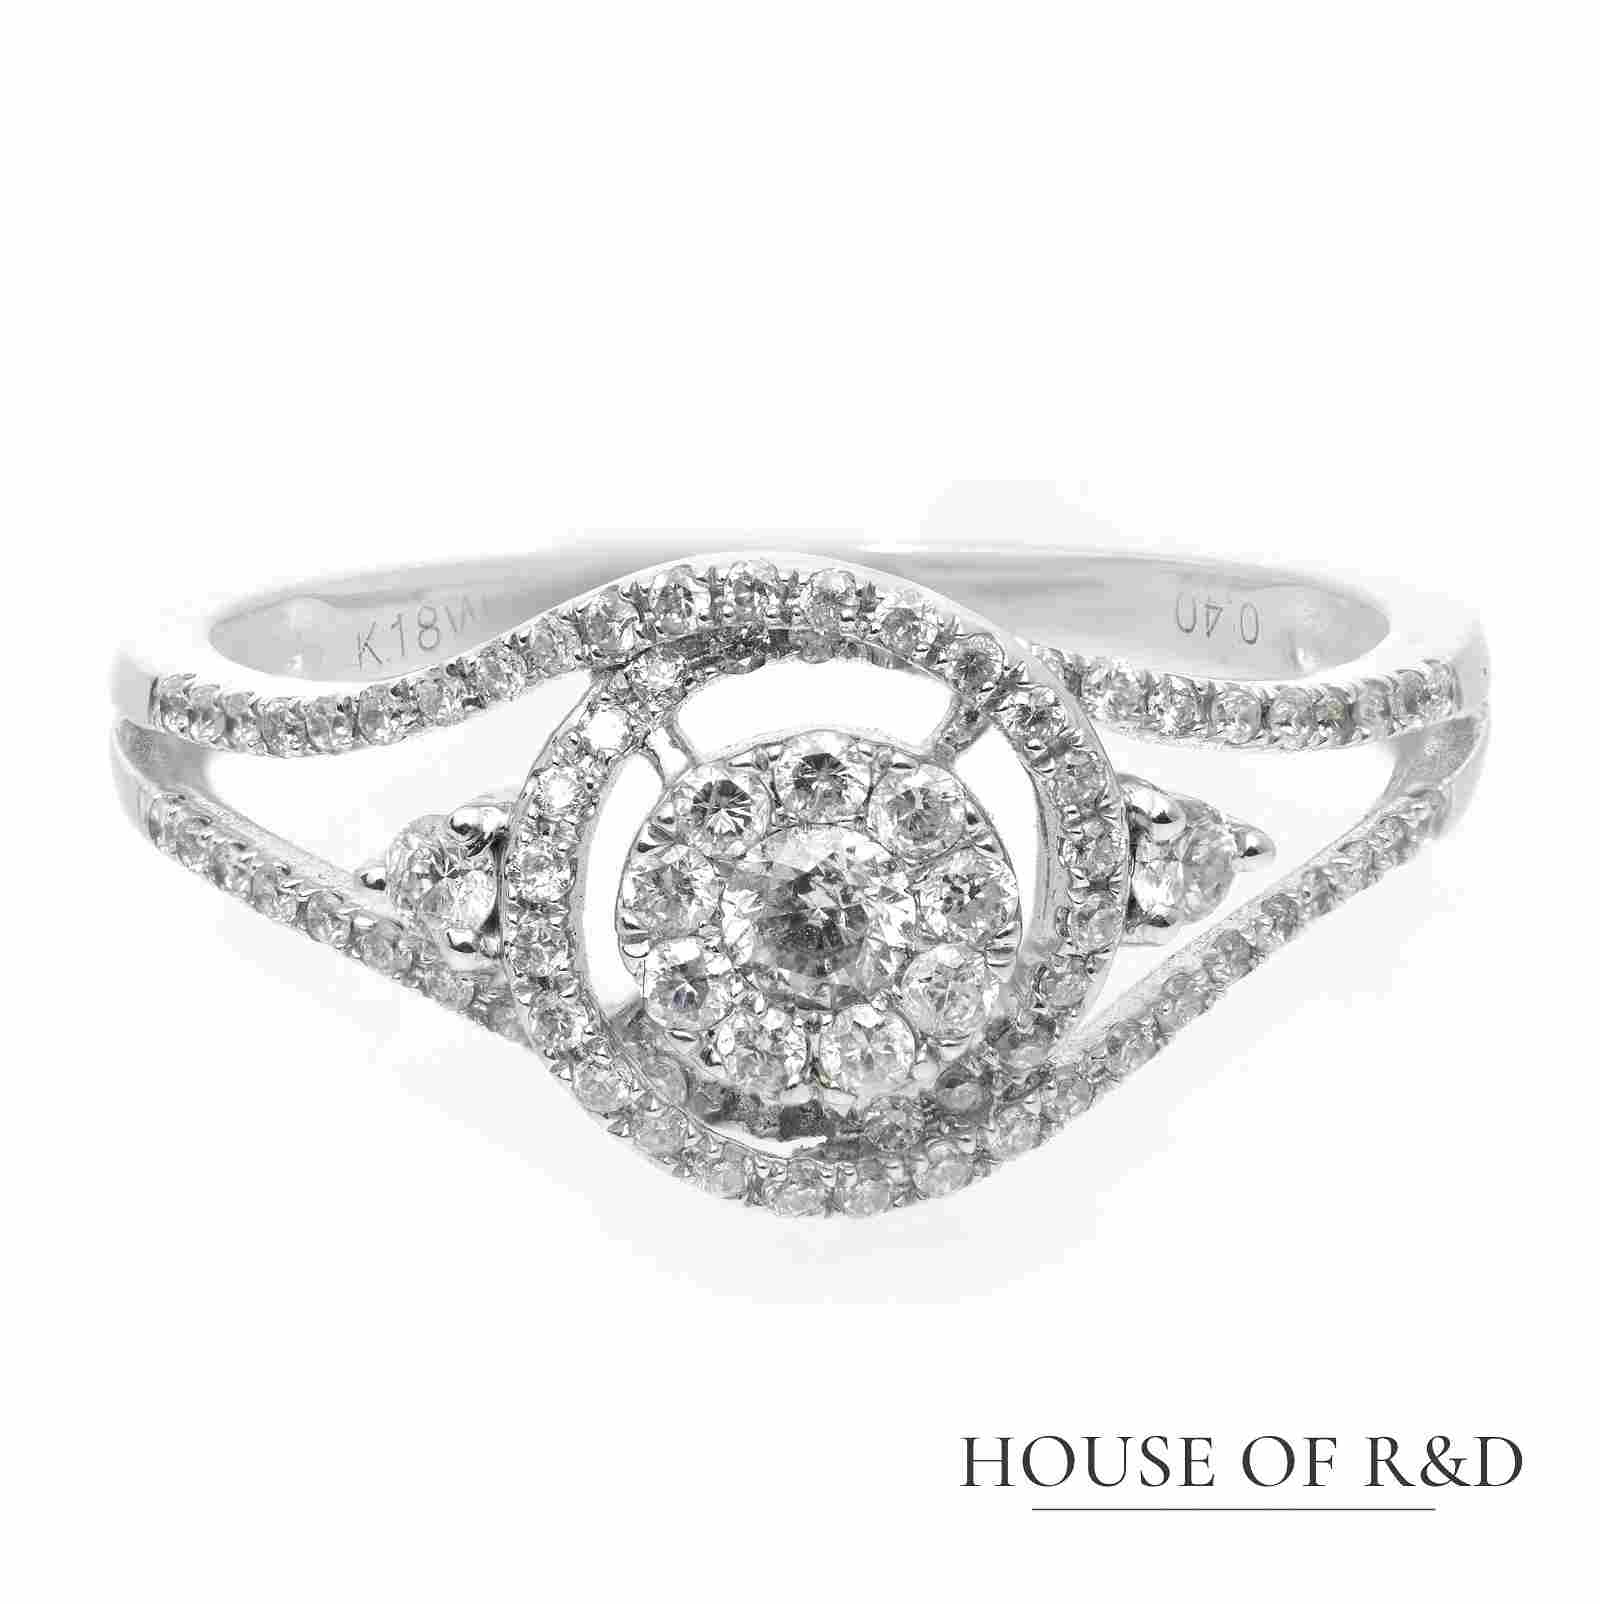 18k White Gold - 0.40tcw - Diamonds Ring